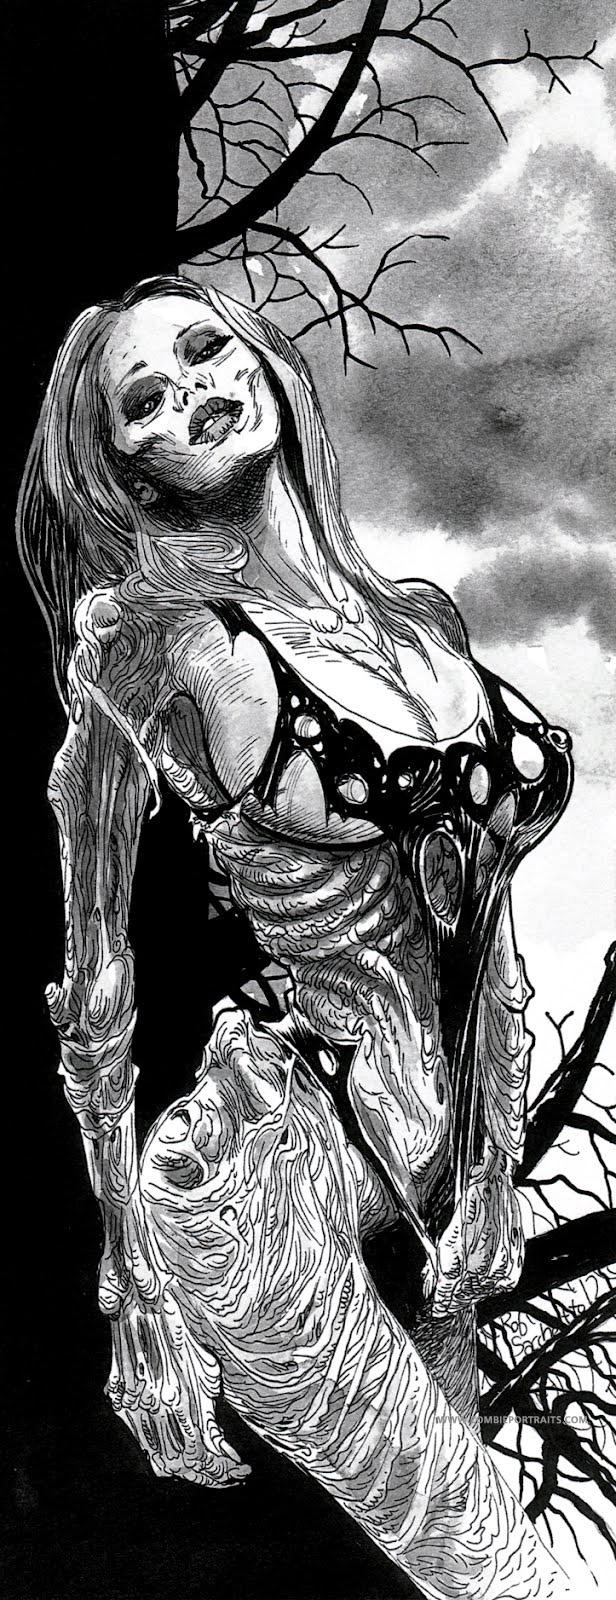 Drawn pin up  grim reaper Zombie Zombie Artist Sacchetto's Babe